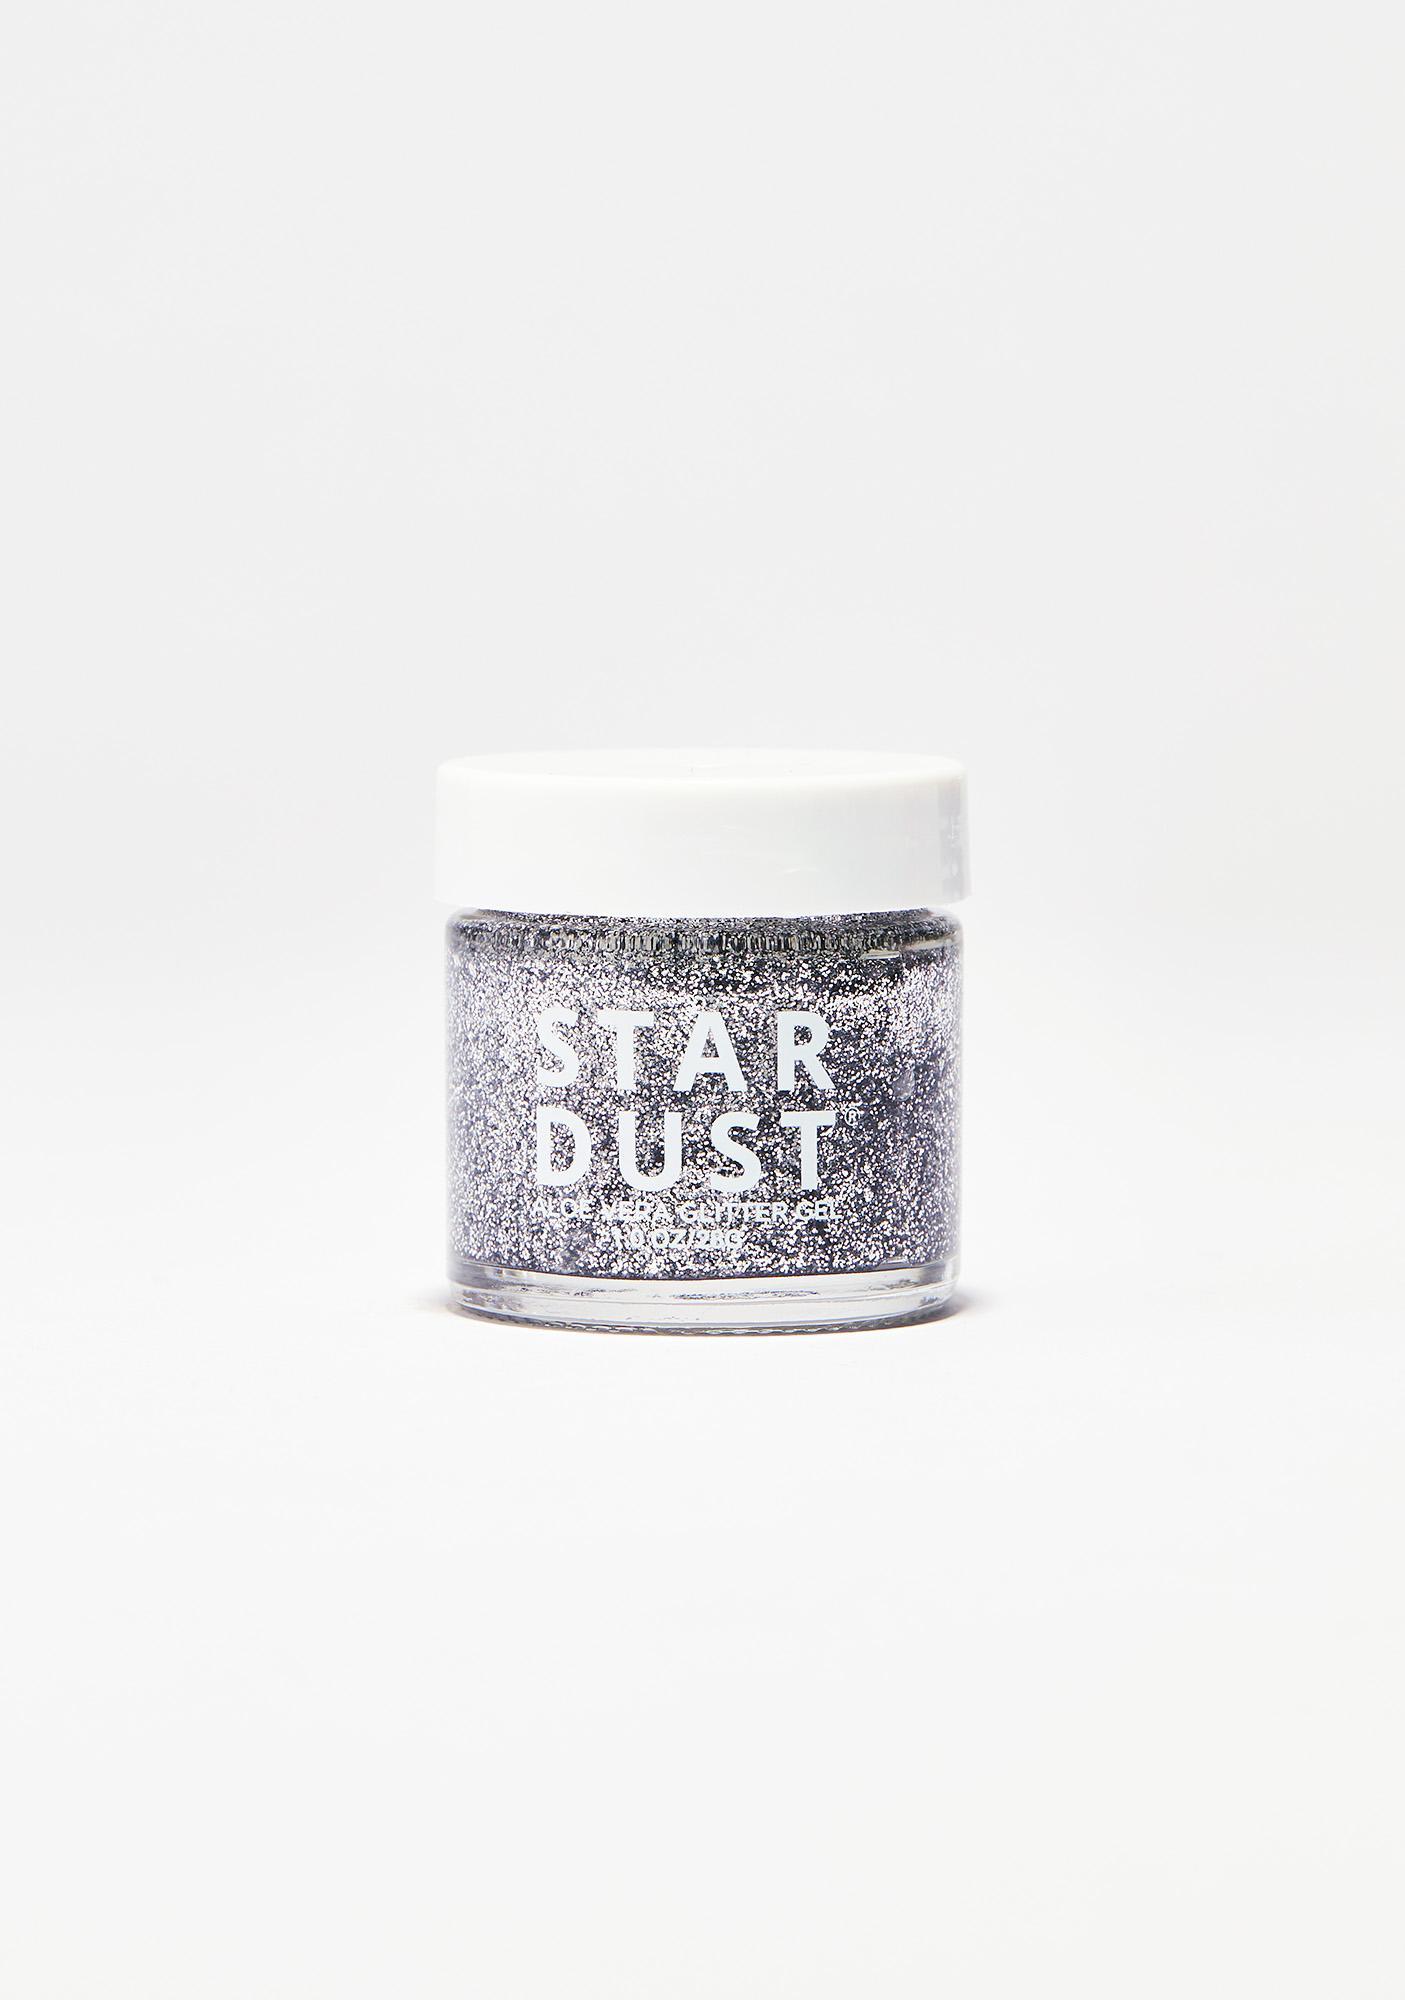 Lavender Stardust Moon Beam Glitter Gel Pot